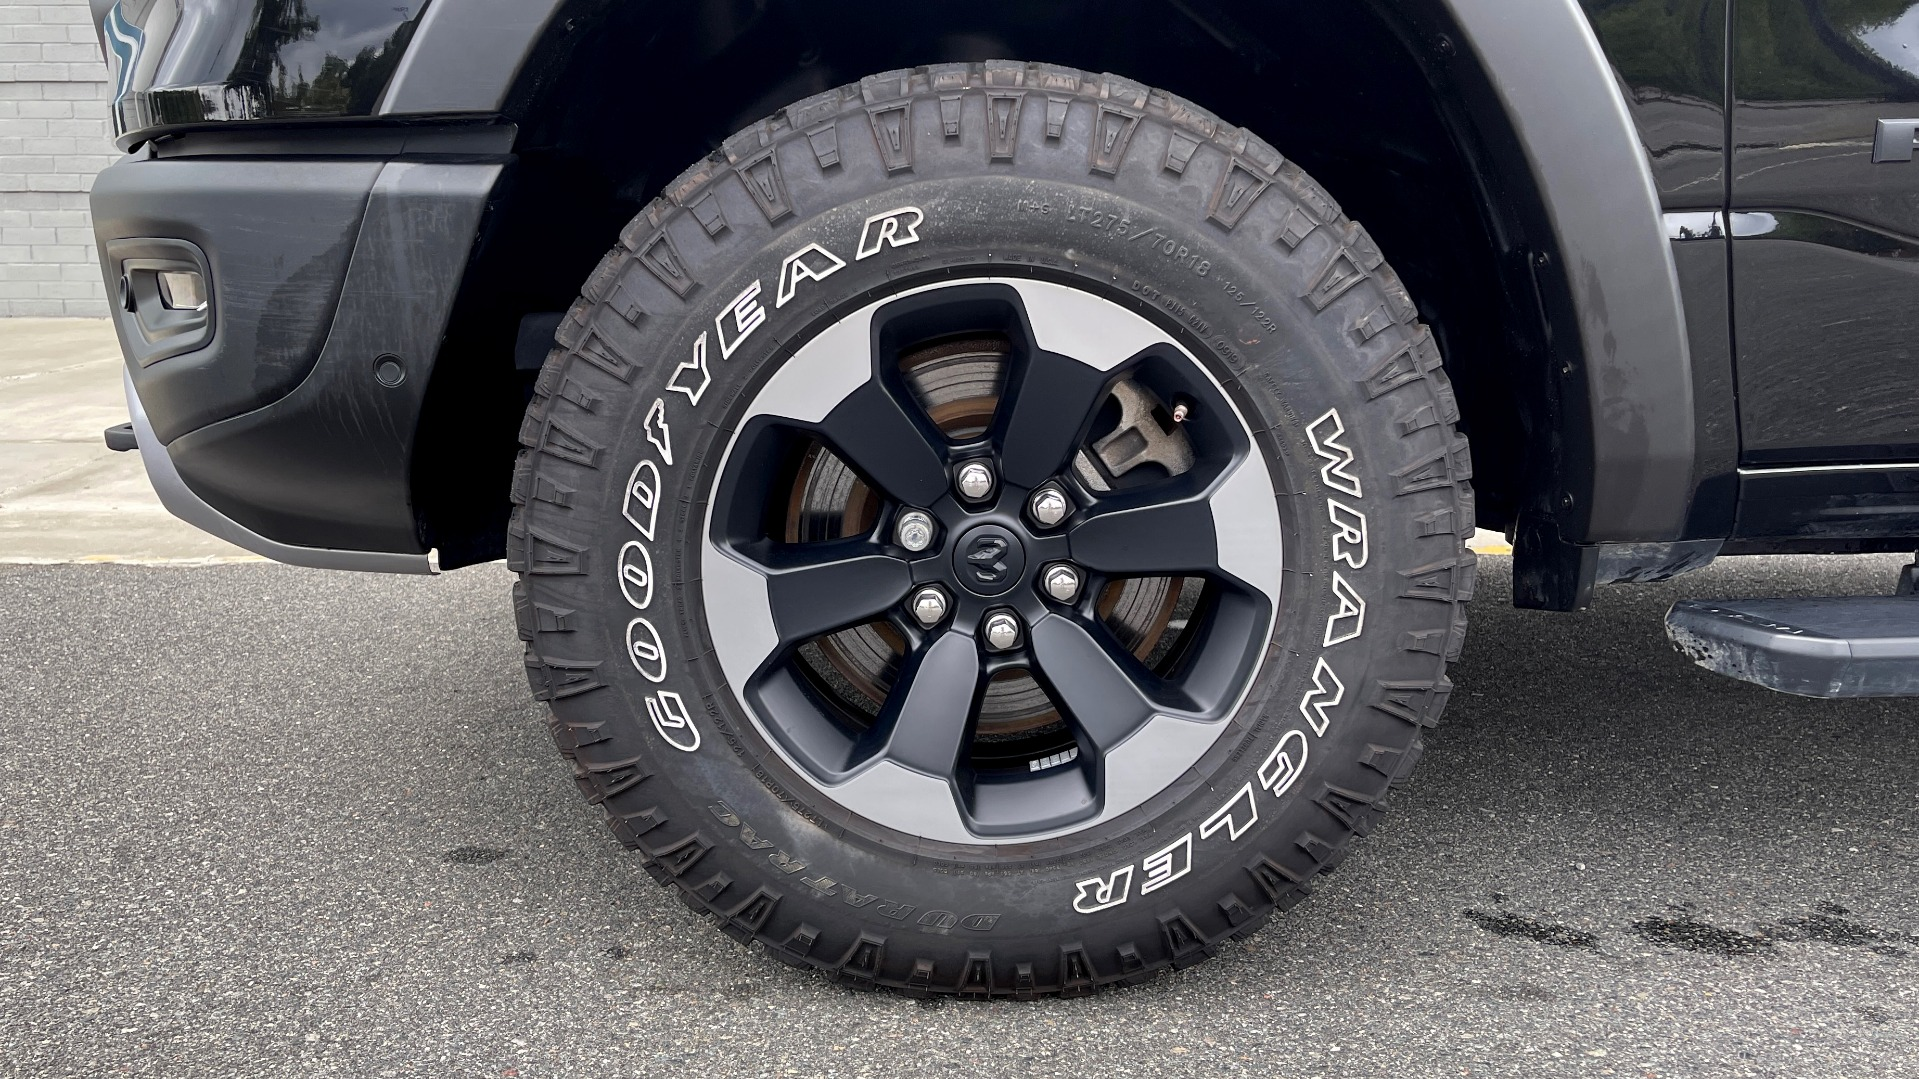 Used 2019 Ram 1500 REBEL QUADCAB 4X4 / 5.7L HEMI / 8-SPD AUTO / REMOTE START / PARK ASSIST for sale $44,495 at Formula Imports in Charlotte NC 28227 69